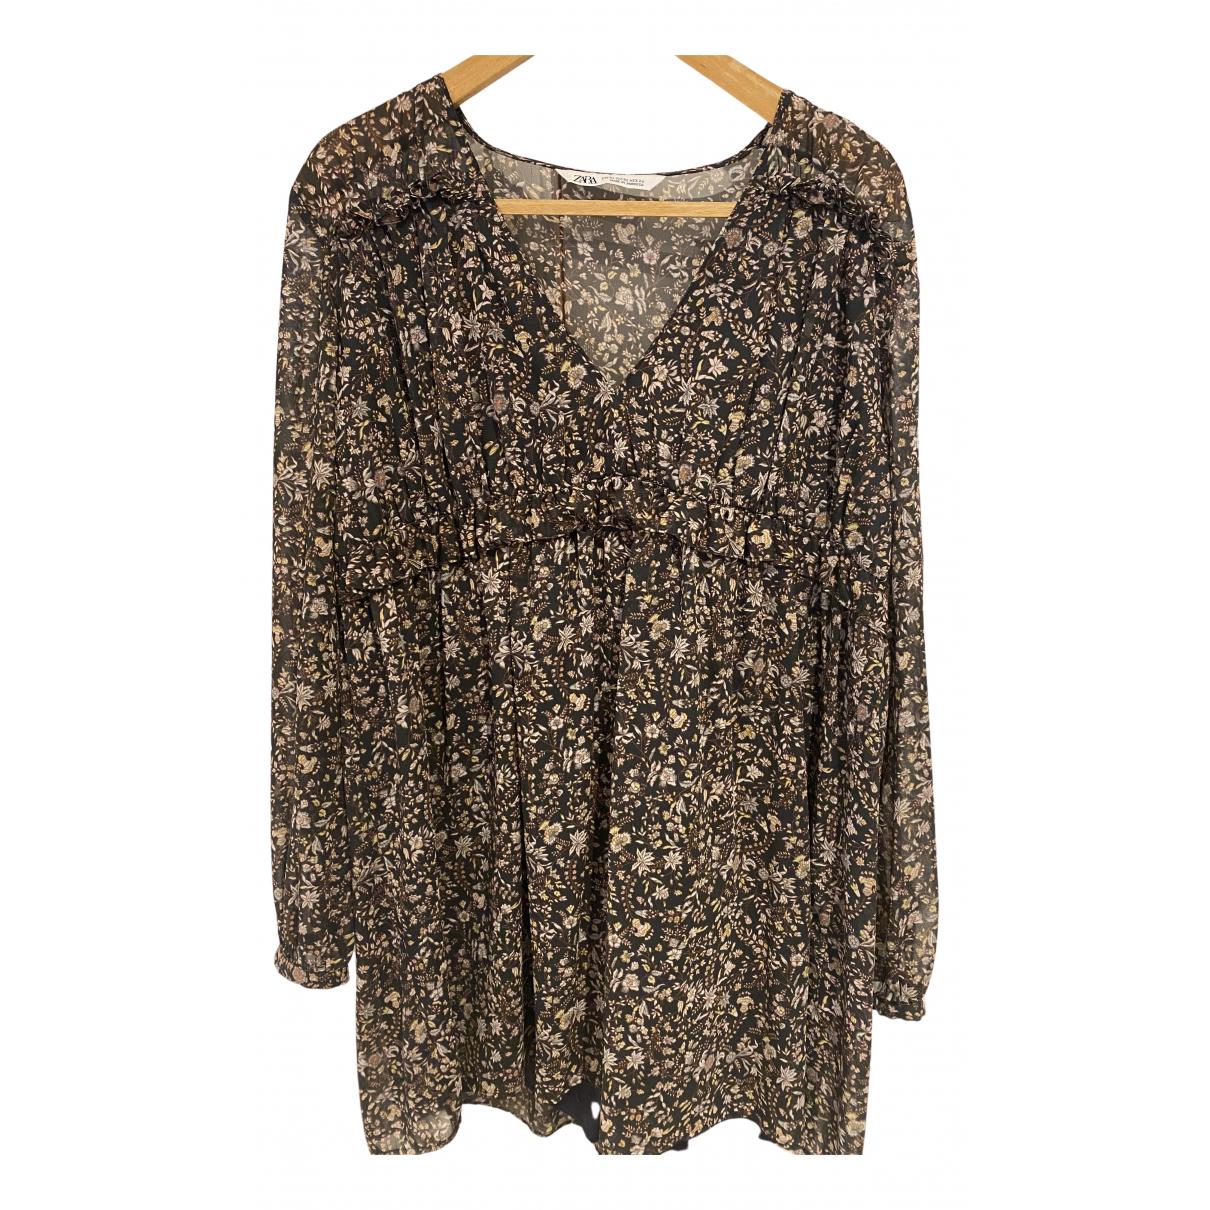 Zara \N Kleid in Seide